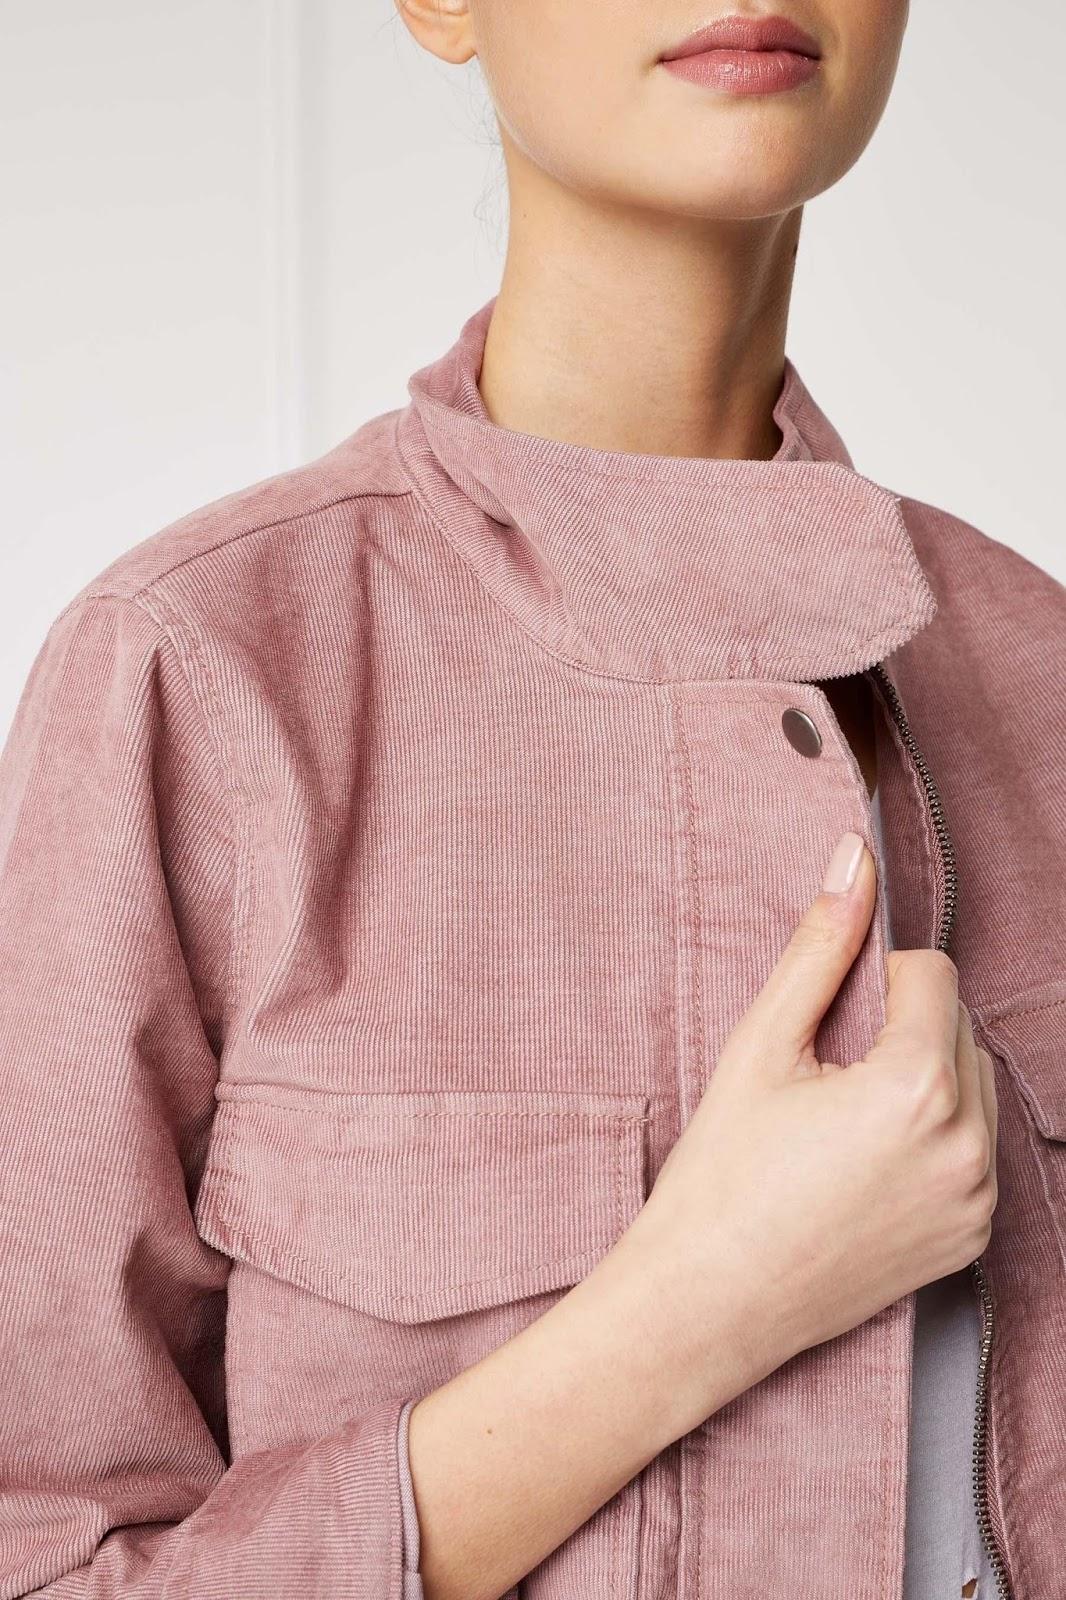 Pink cord jacket next